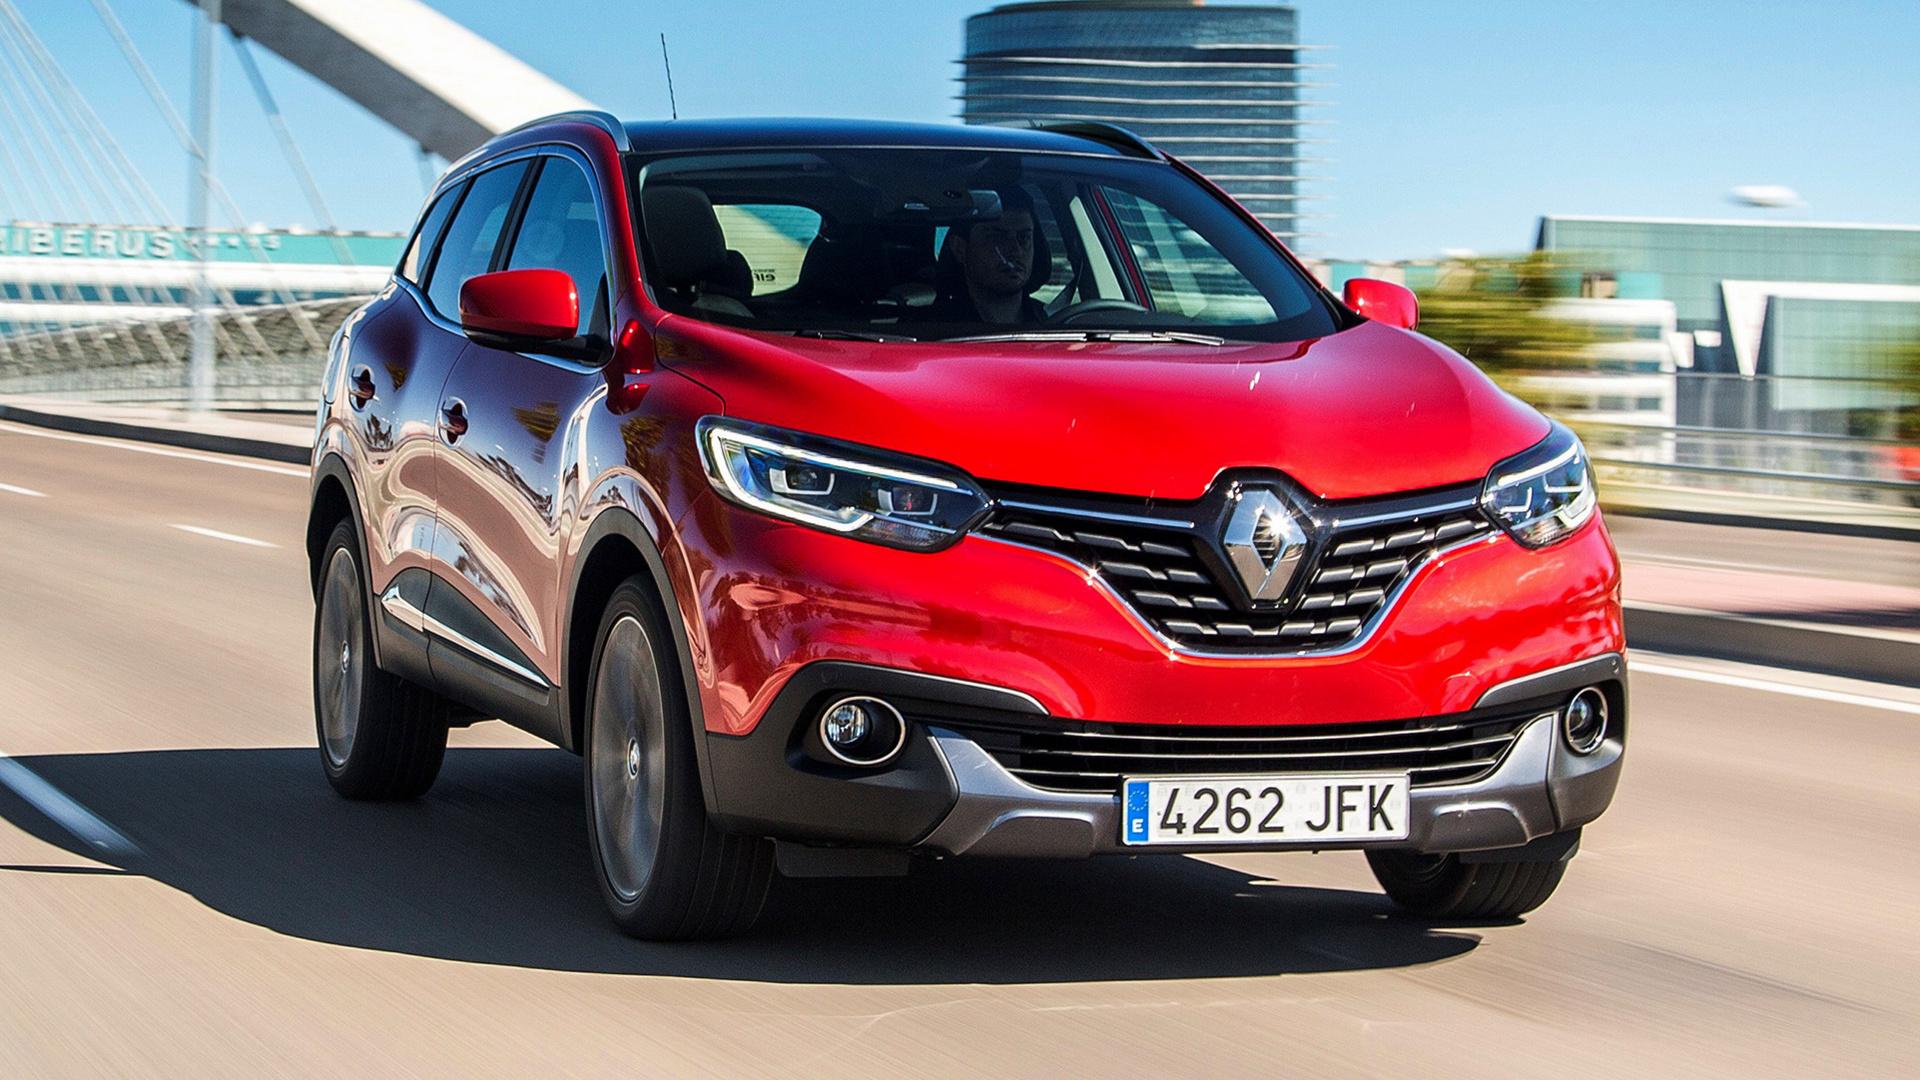 2015 Renault Kadjar Wallpapers And HD Images Car Pixel